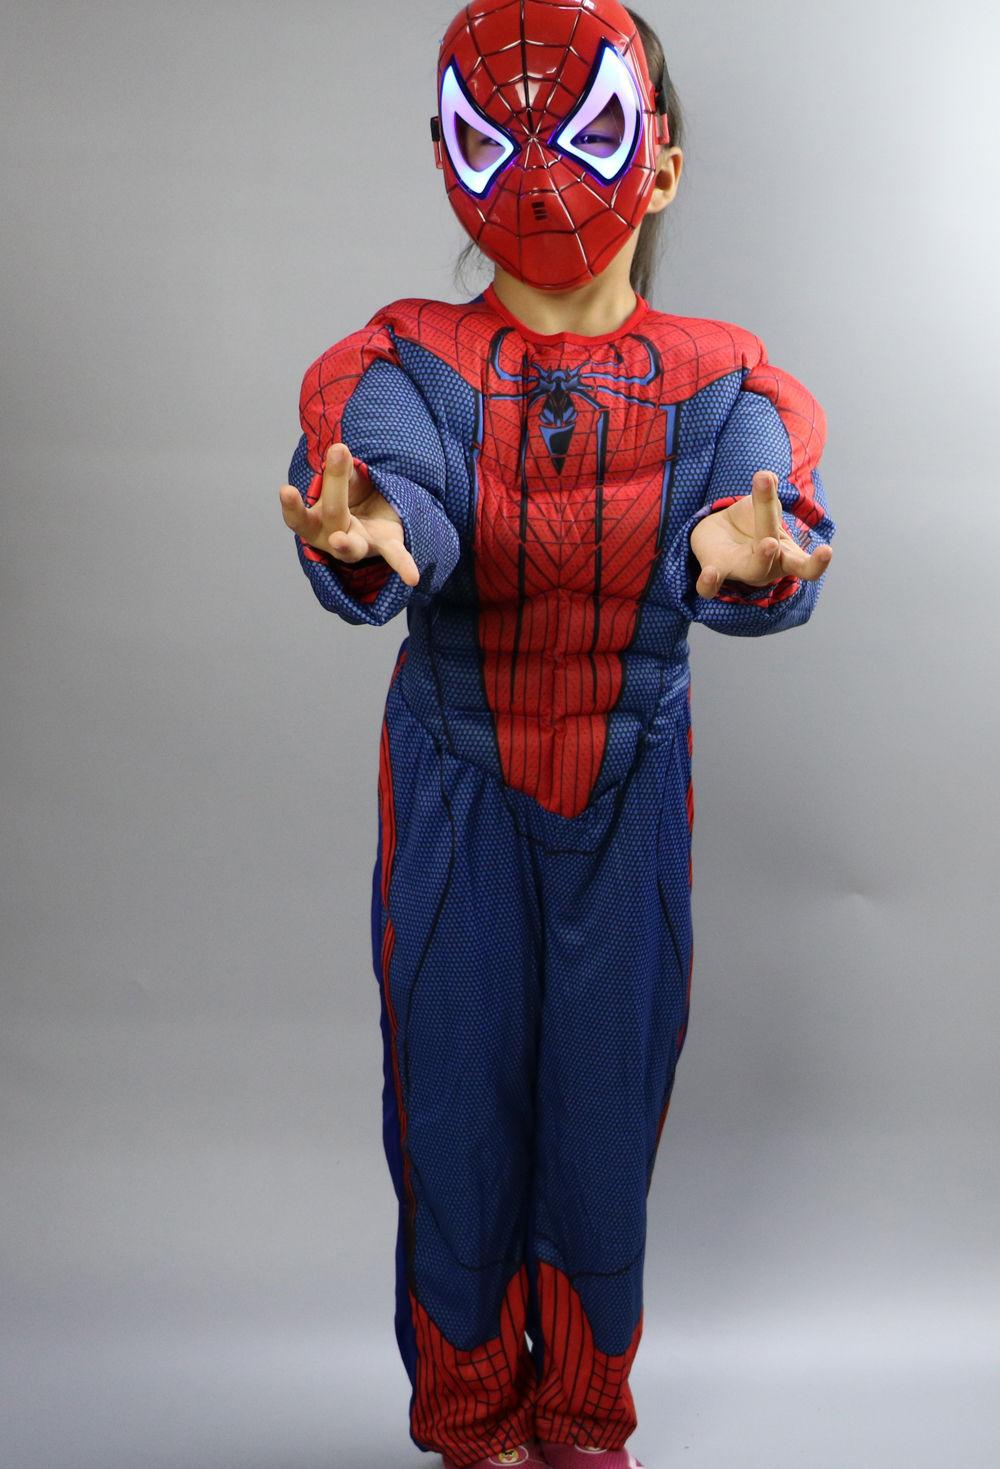 777da80c9d52 403 inzerátů • 66 hodnocení. Krásný dětský karnevalový kostým - spiderman  ...